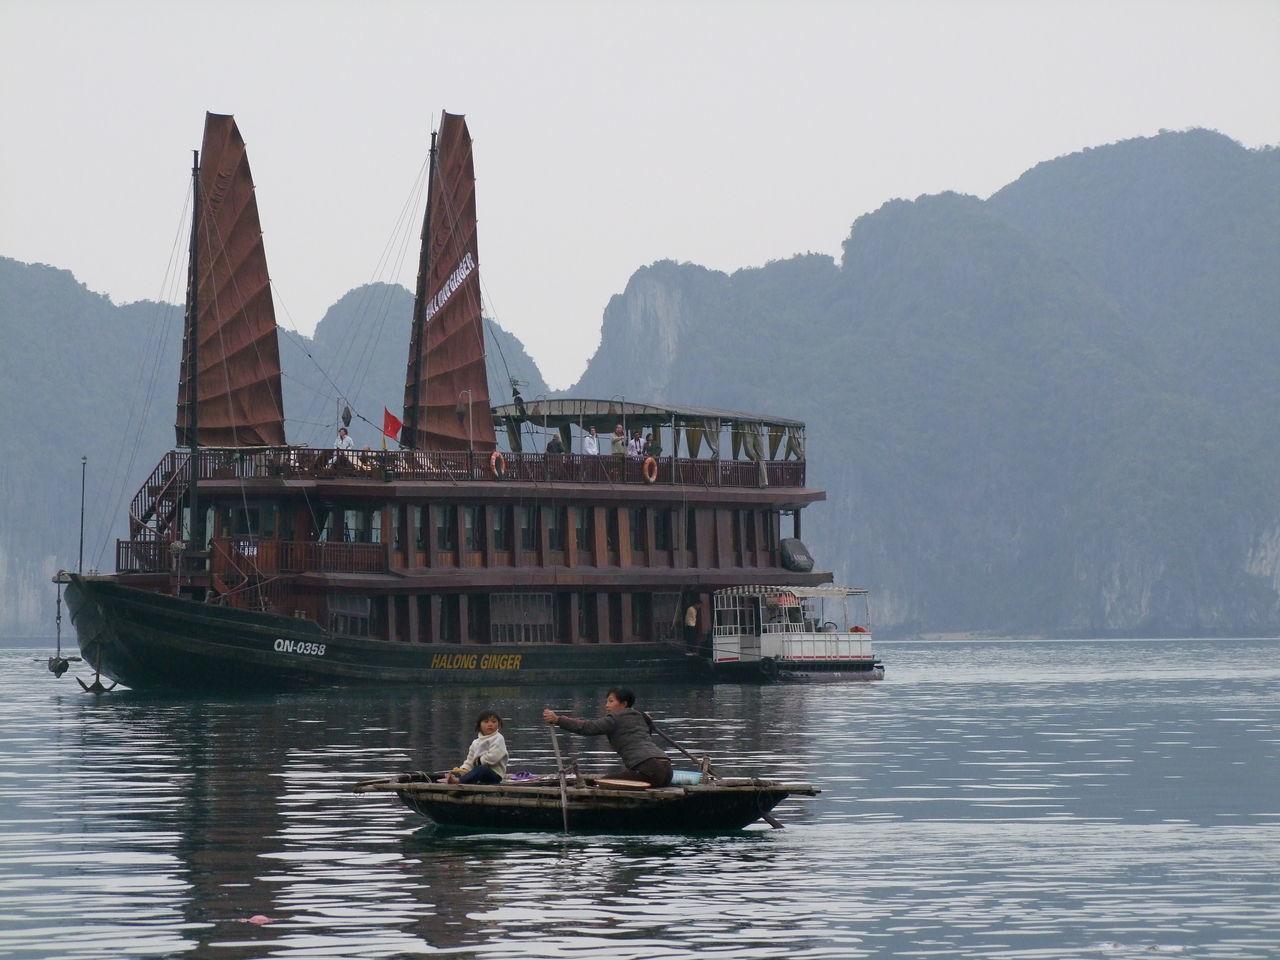 Beautiful stock photos of vietnam, mode of transport, transportation, nautical vessel, water